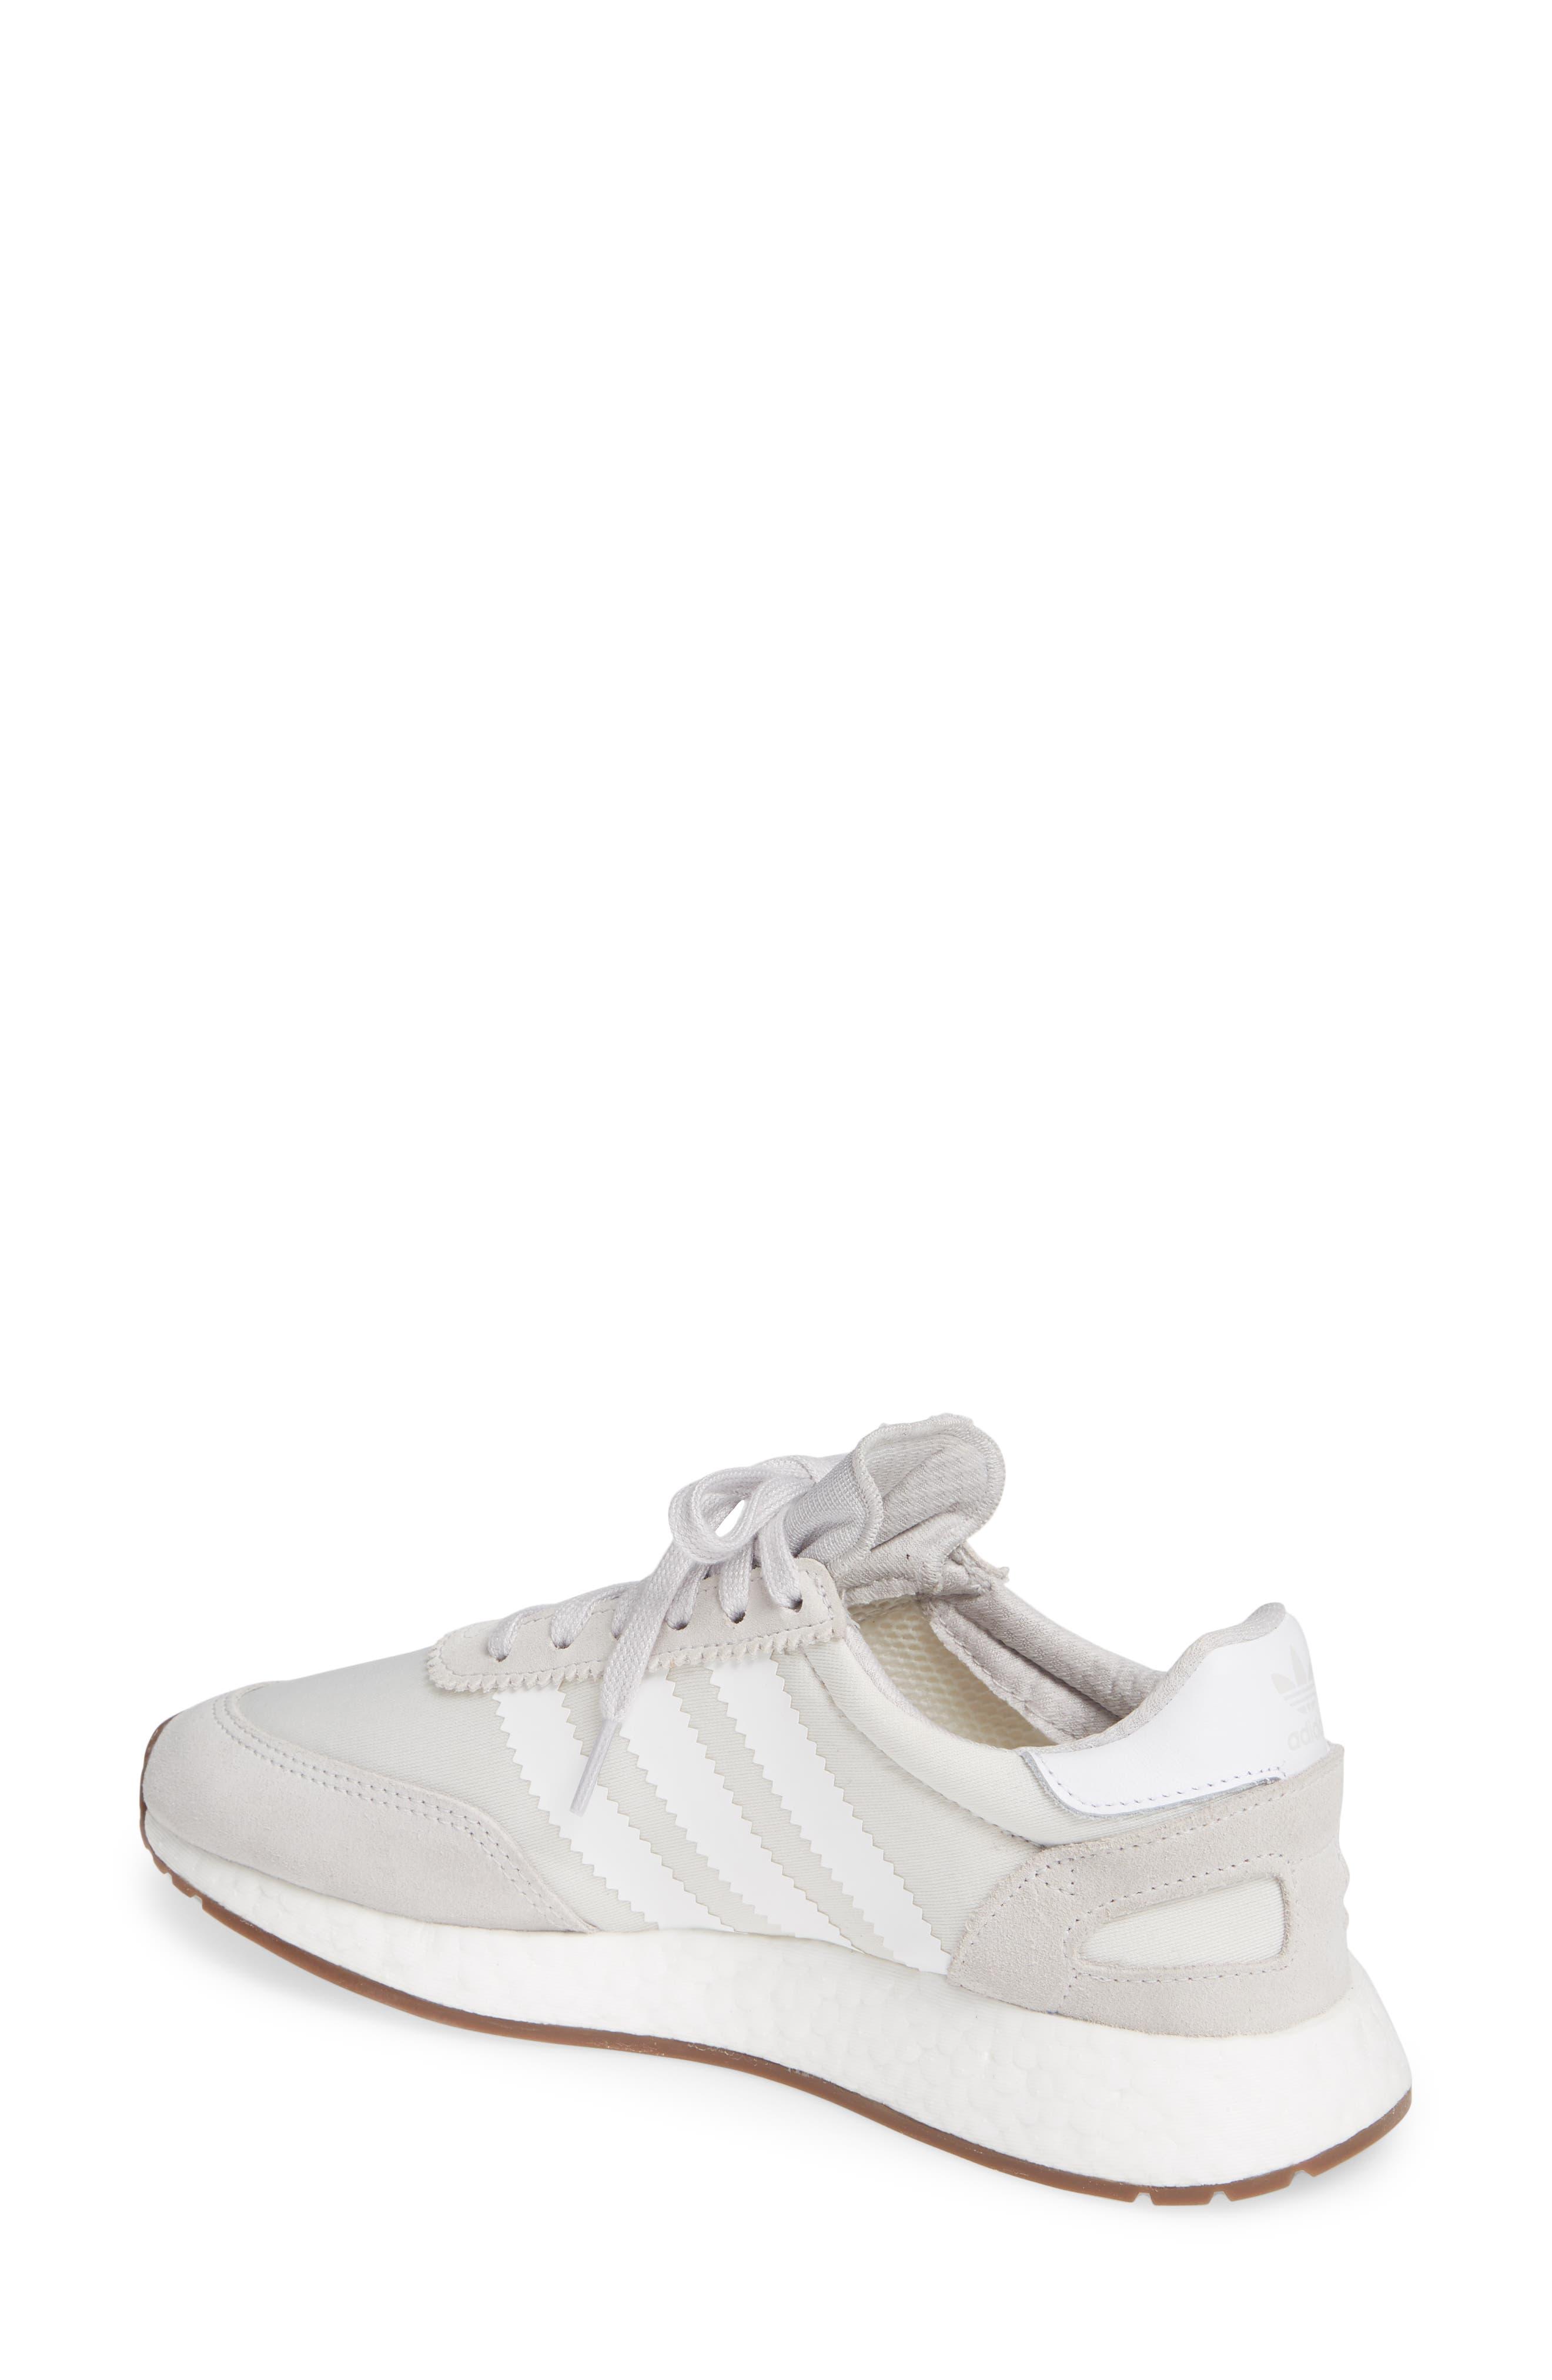 I-5923 Sneaker,                             Alternate thumbnail 2, color,                             GREY ONE/ WHITE/ GREY FIVE